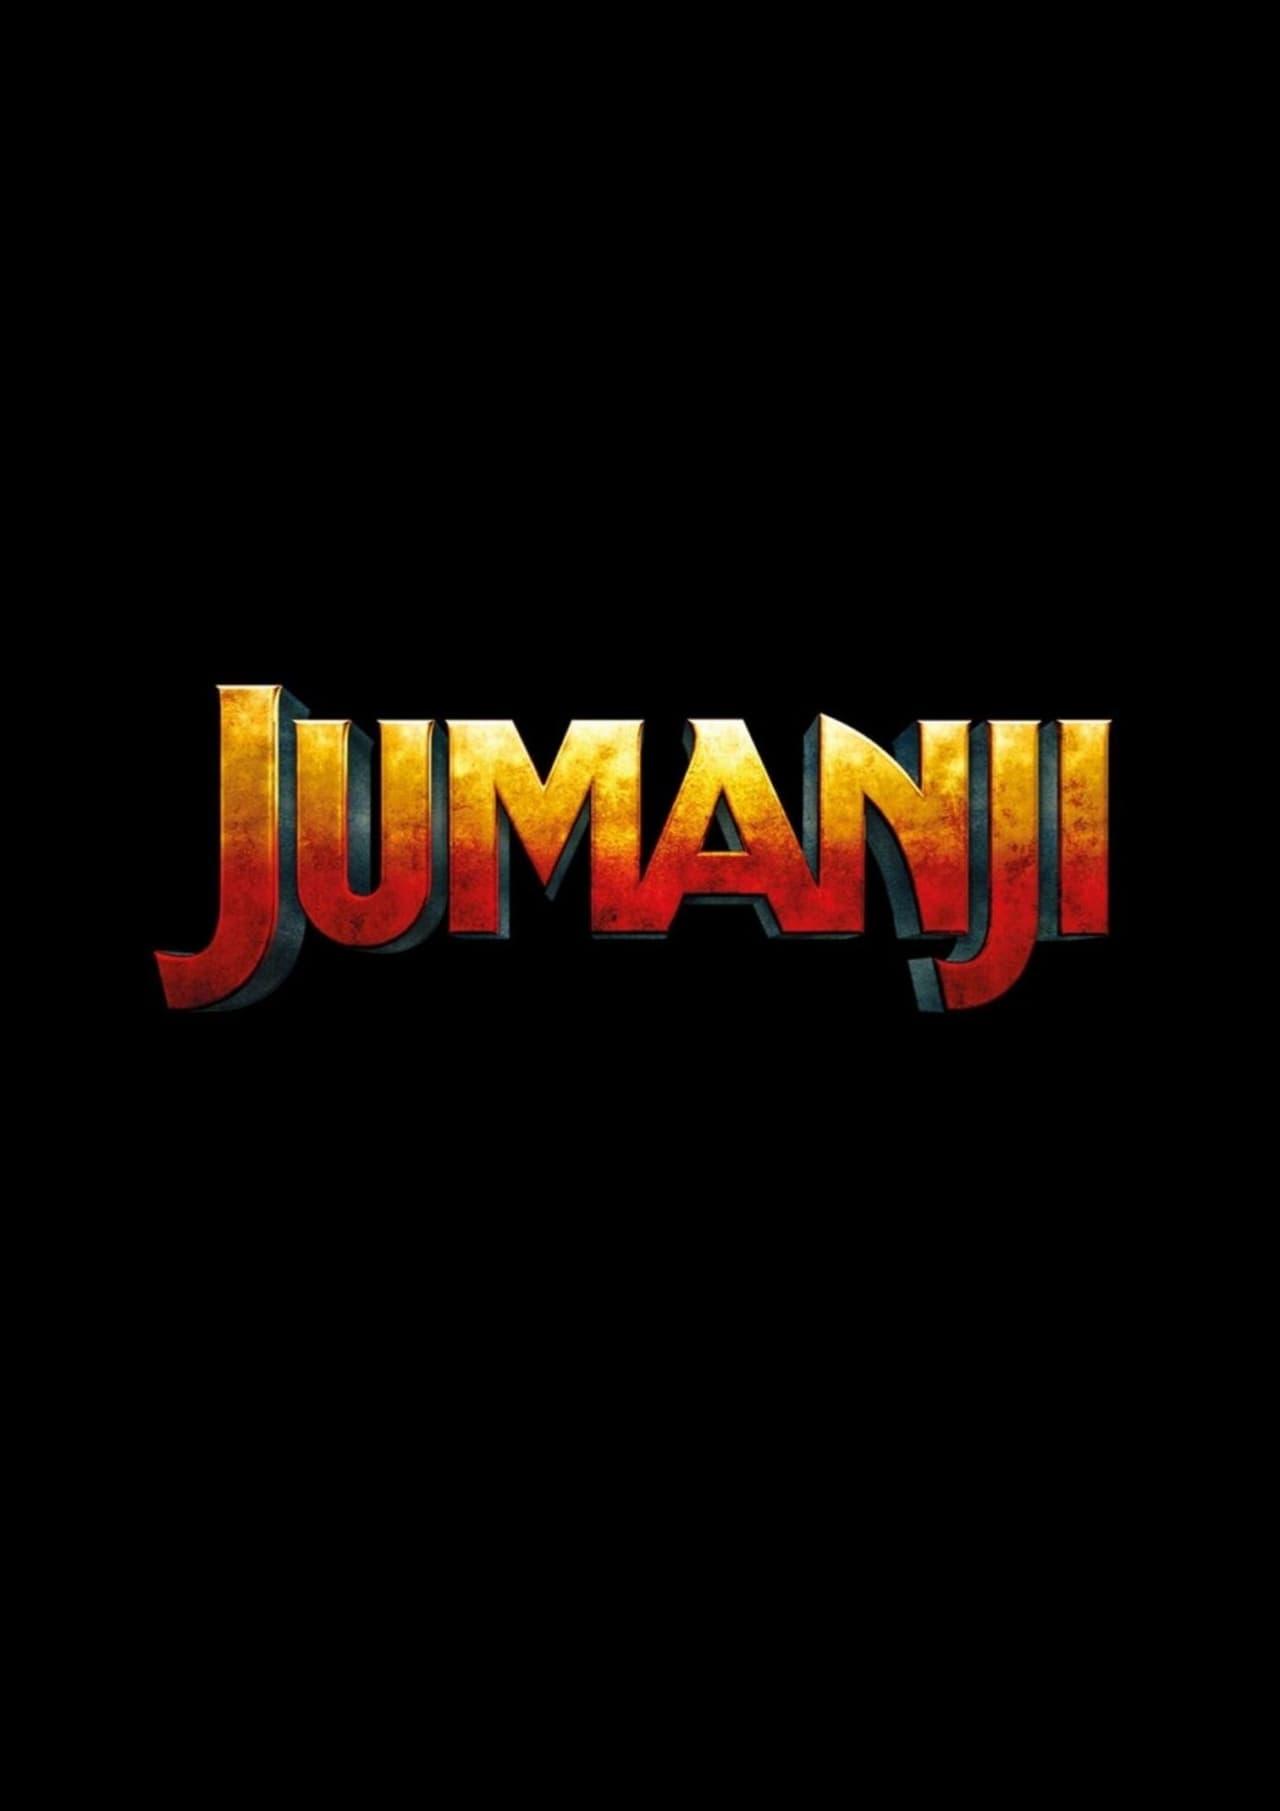 Untitled Jumanji Sequel